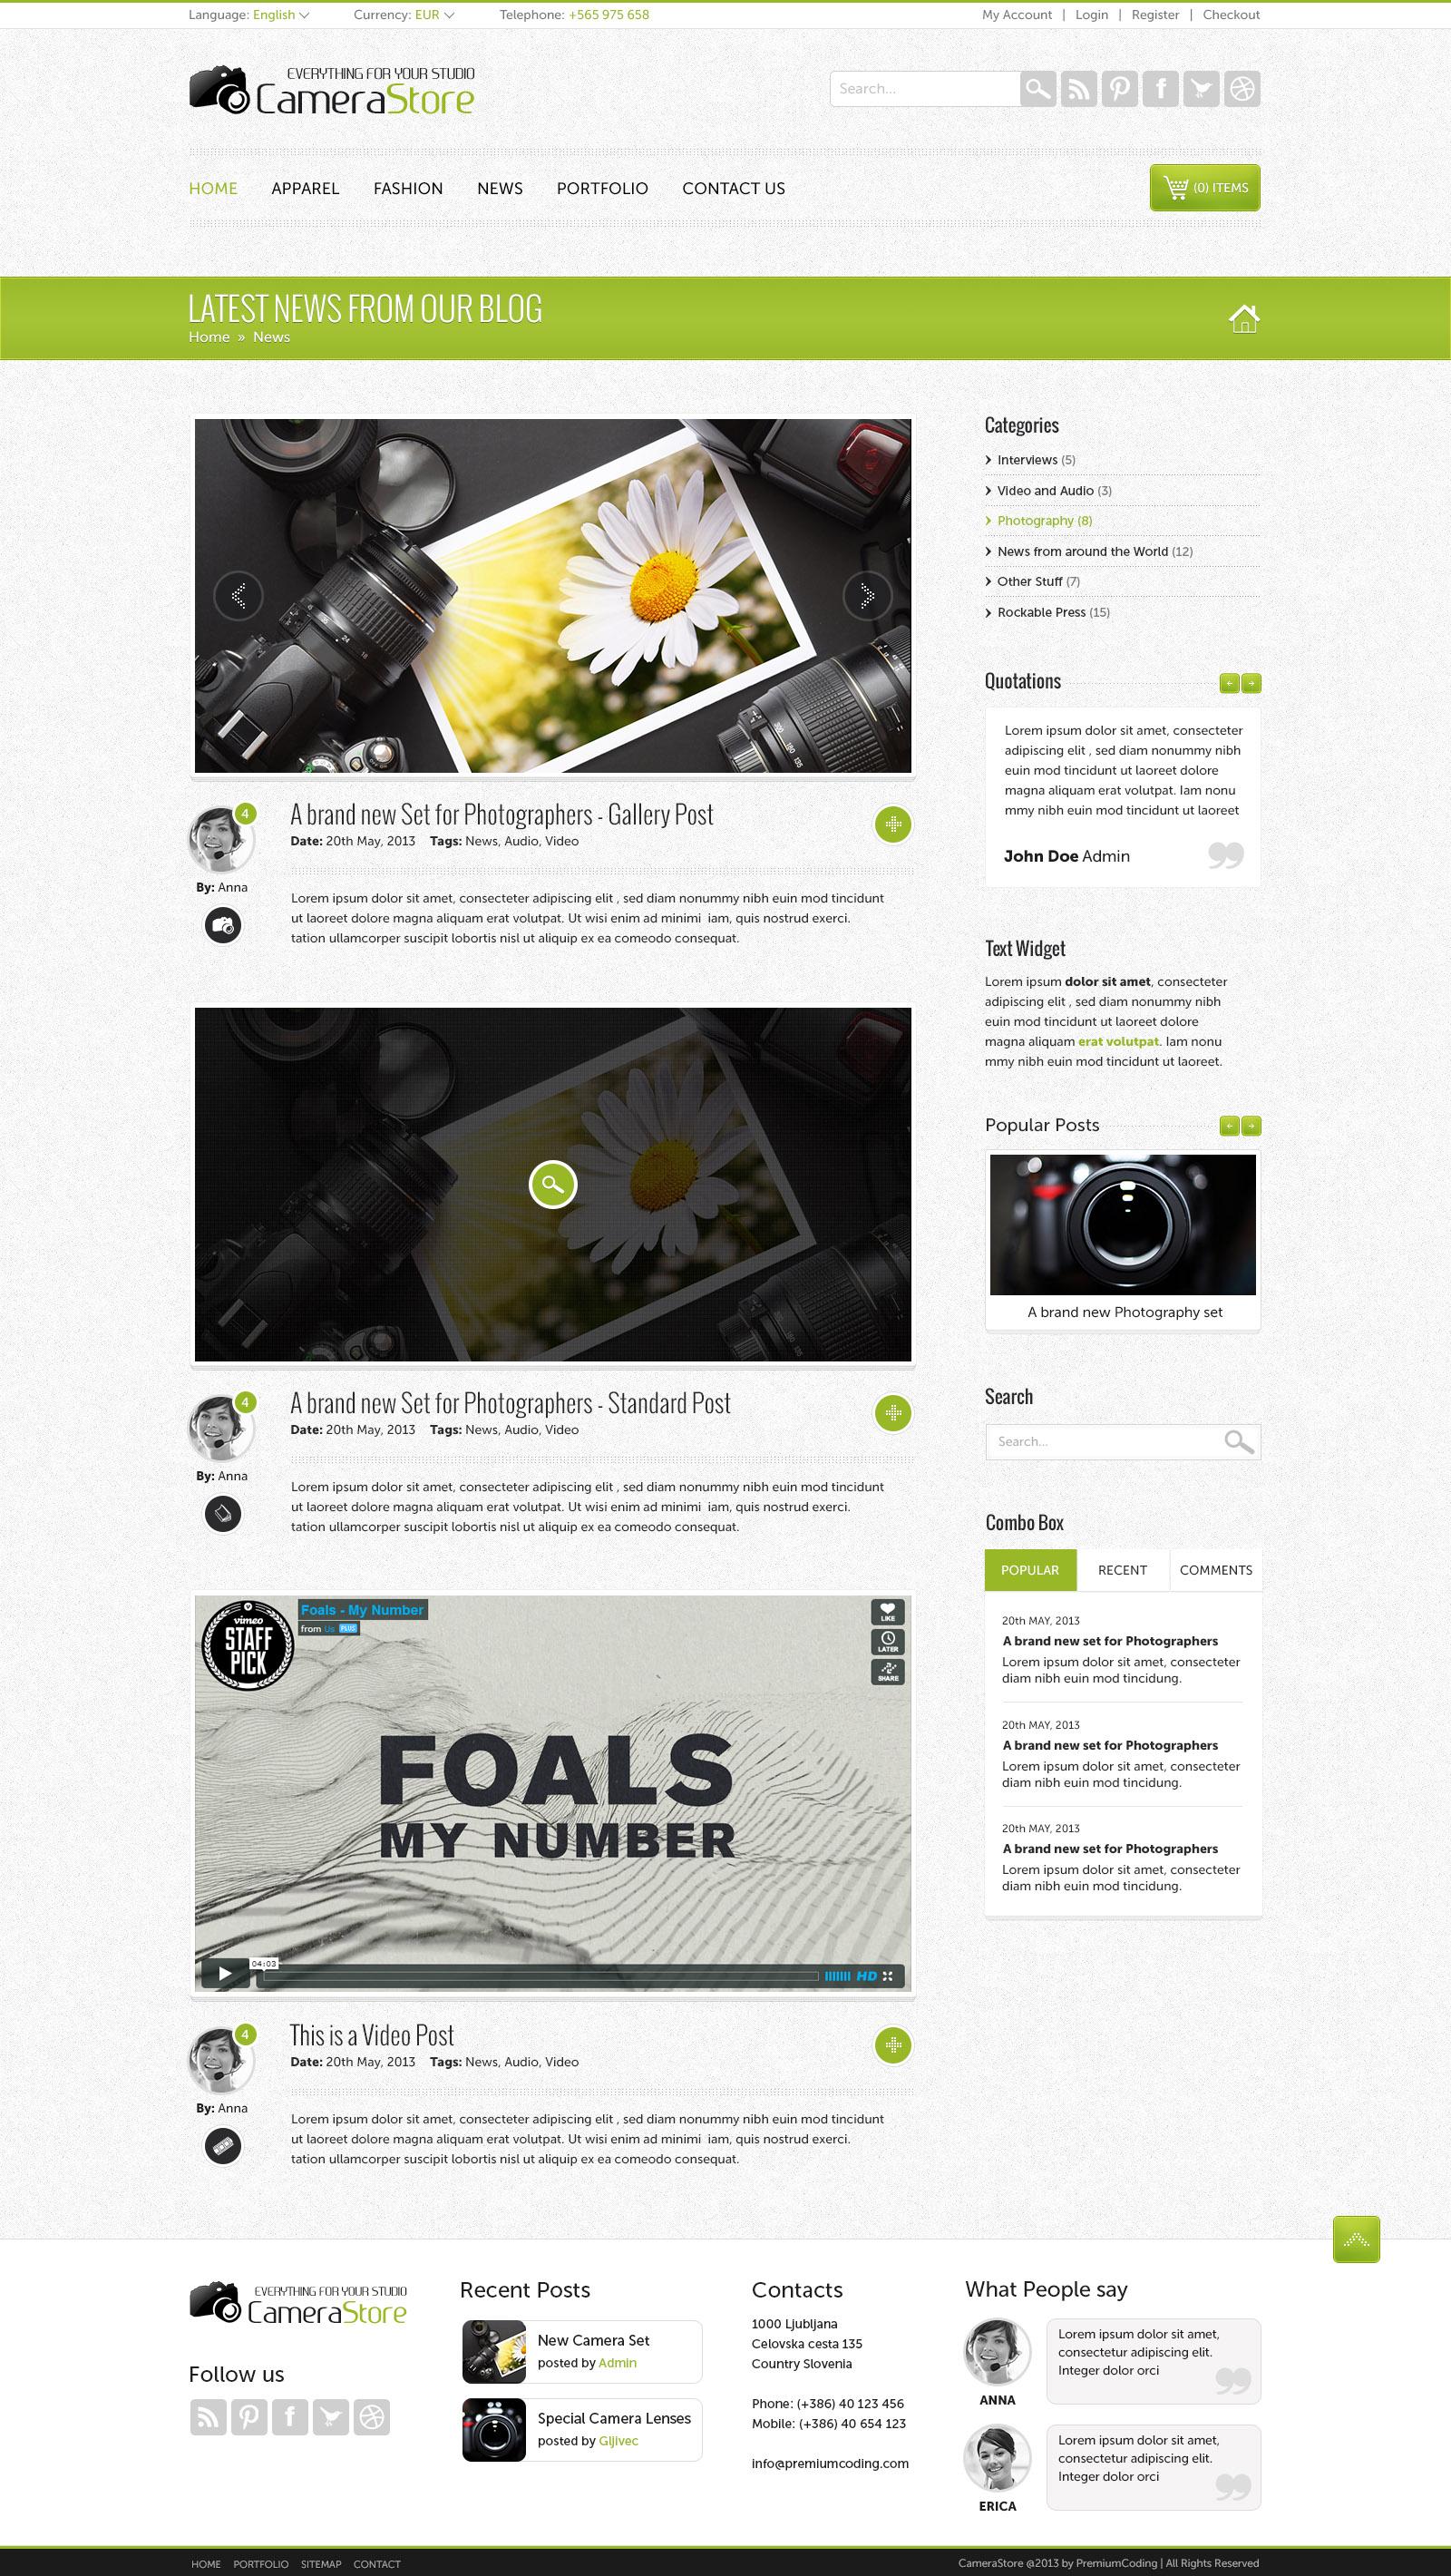 13 blog design psd images free photoshop psd templates download wordpress blog templates free. Black Bedroom Furniture Sets. Home Design Ideas